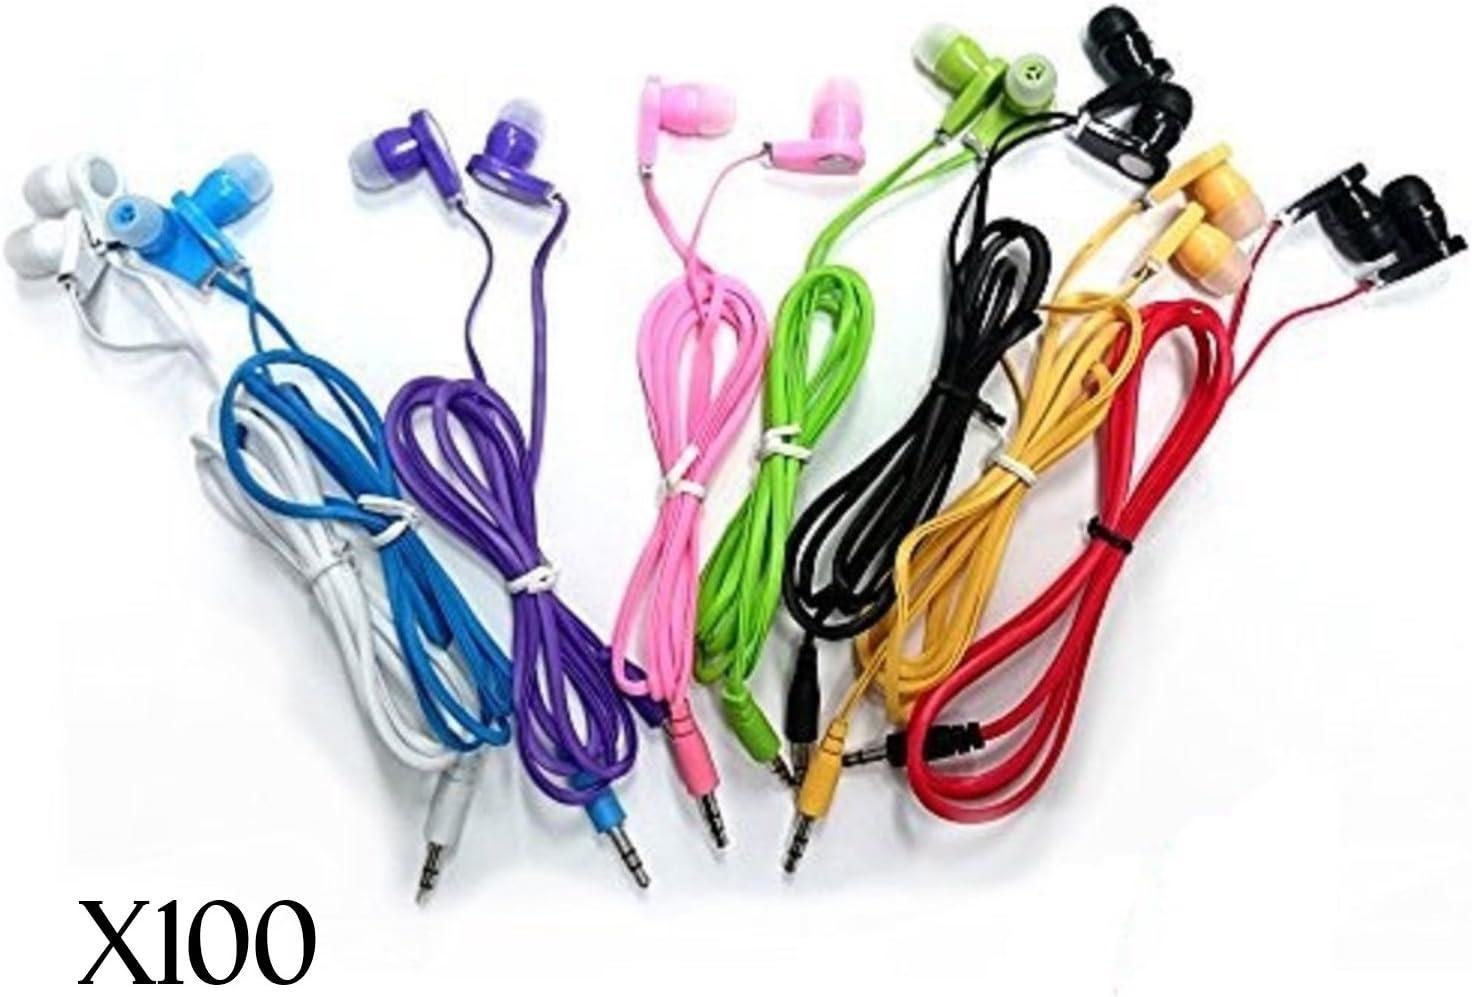 JustJamz 3.5mm Stereo in-Ear Bulk Earbud Headphones Wholesale Earphones for Classroom Library Kids (Assorted Colors), 100 Pack